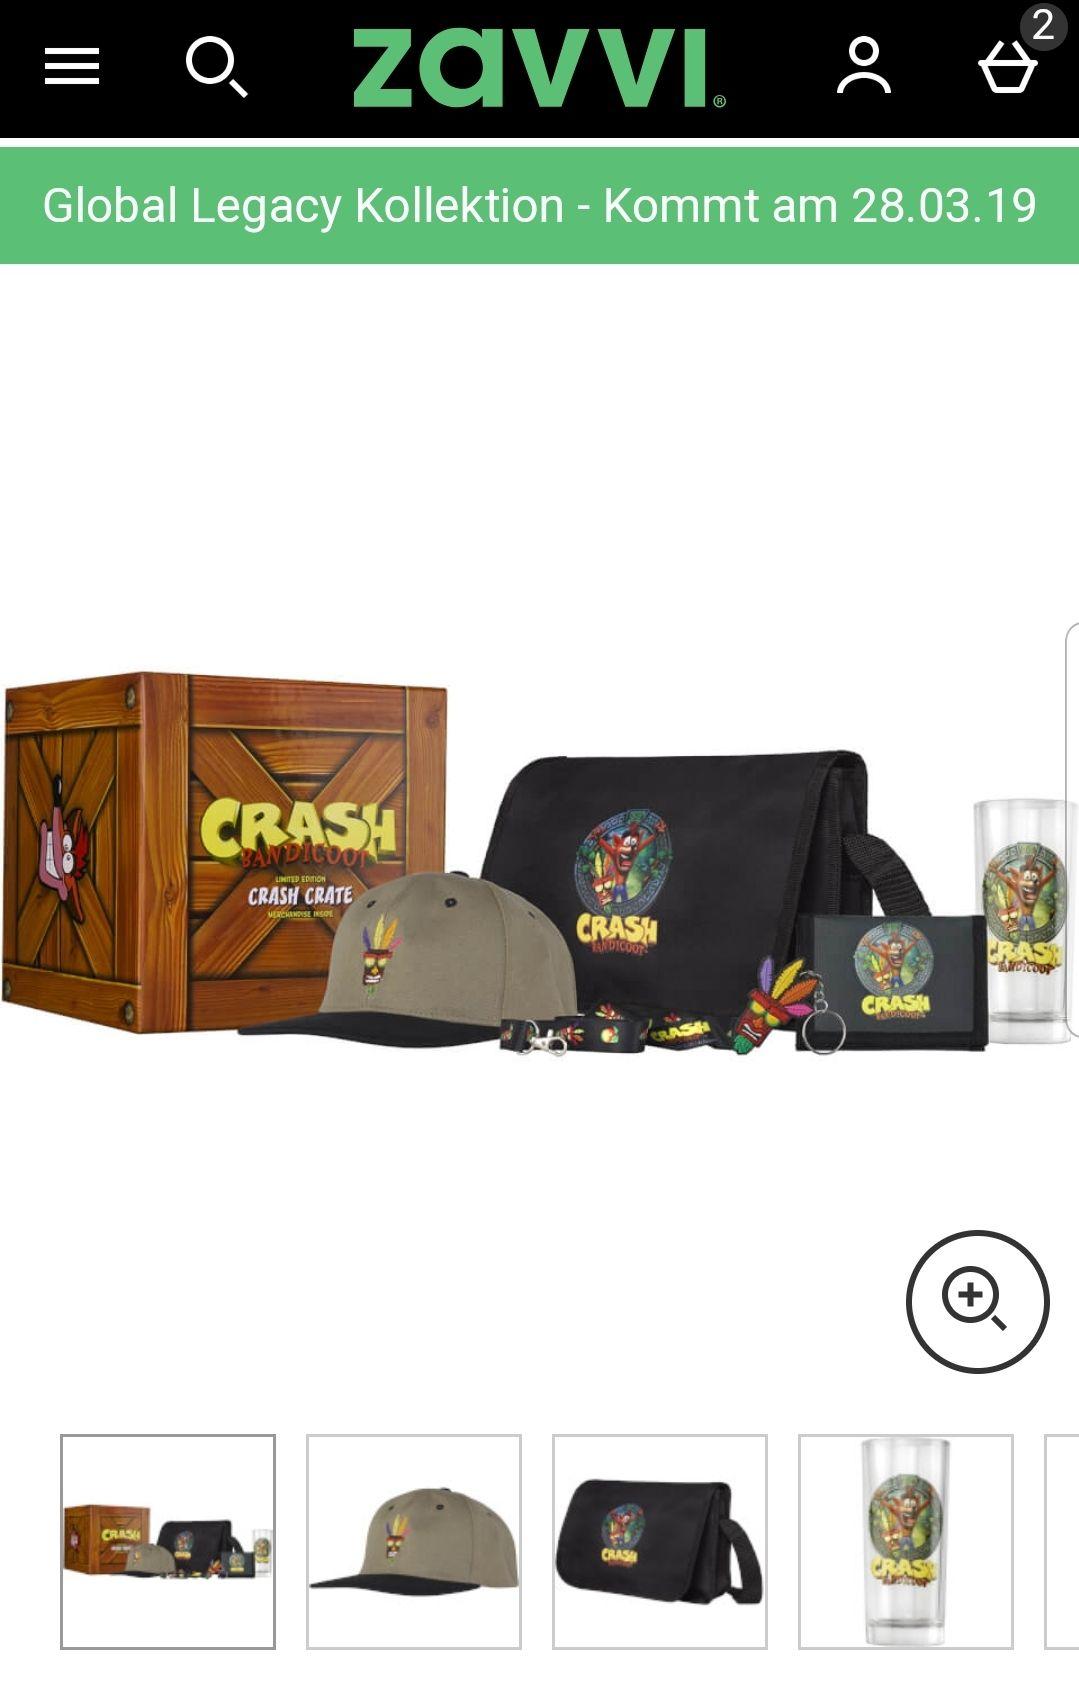 Crash Bandicoot Collectable Merch Big Box